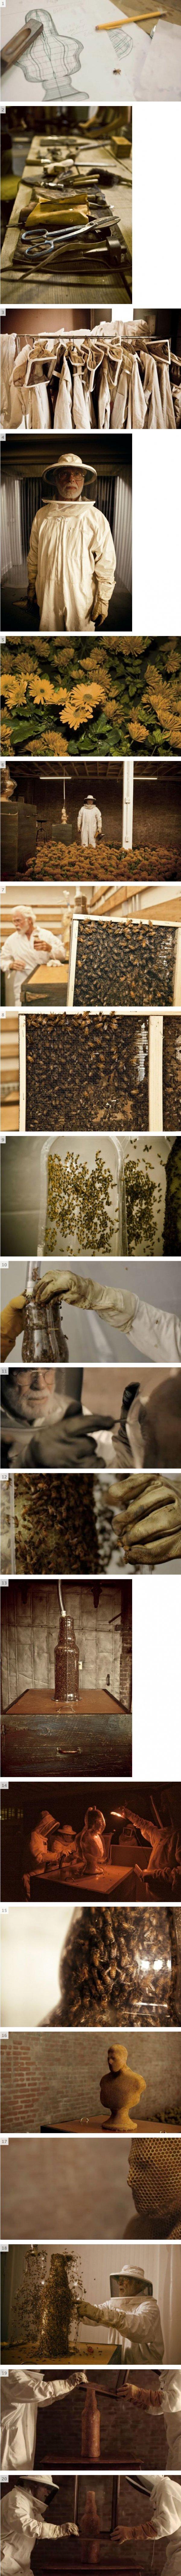 natural 3D -Printer. .. Bees are still pretty stupid...